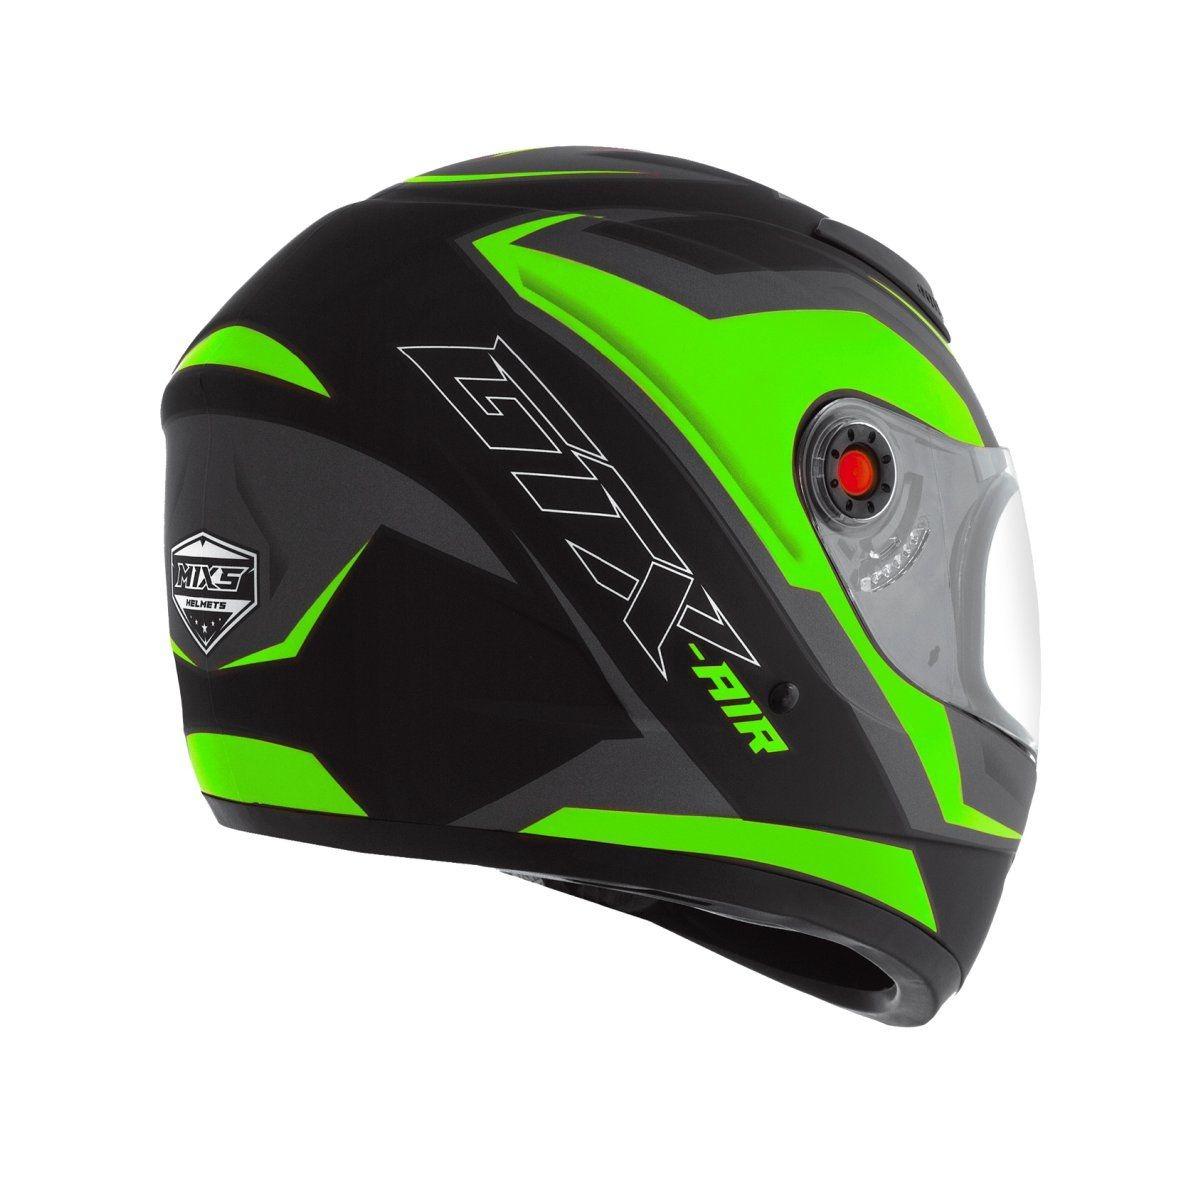 capacete moto mixs fokker gtx air transfer fosco lancamento. Carregando  zoom. ec8f0d204f7